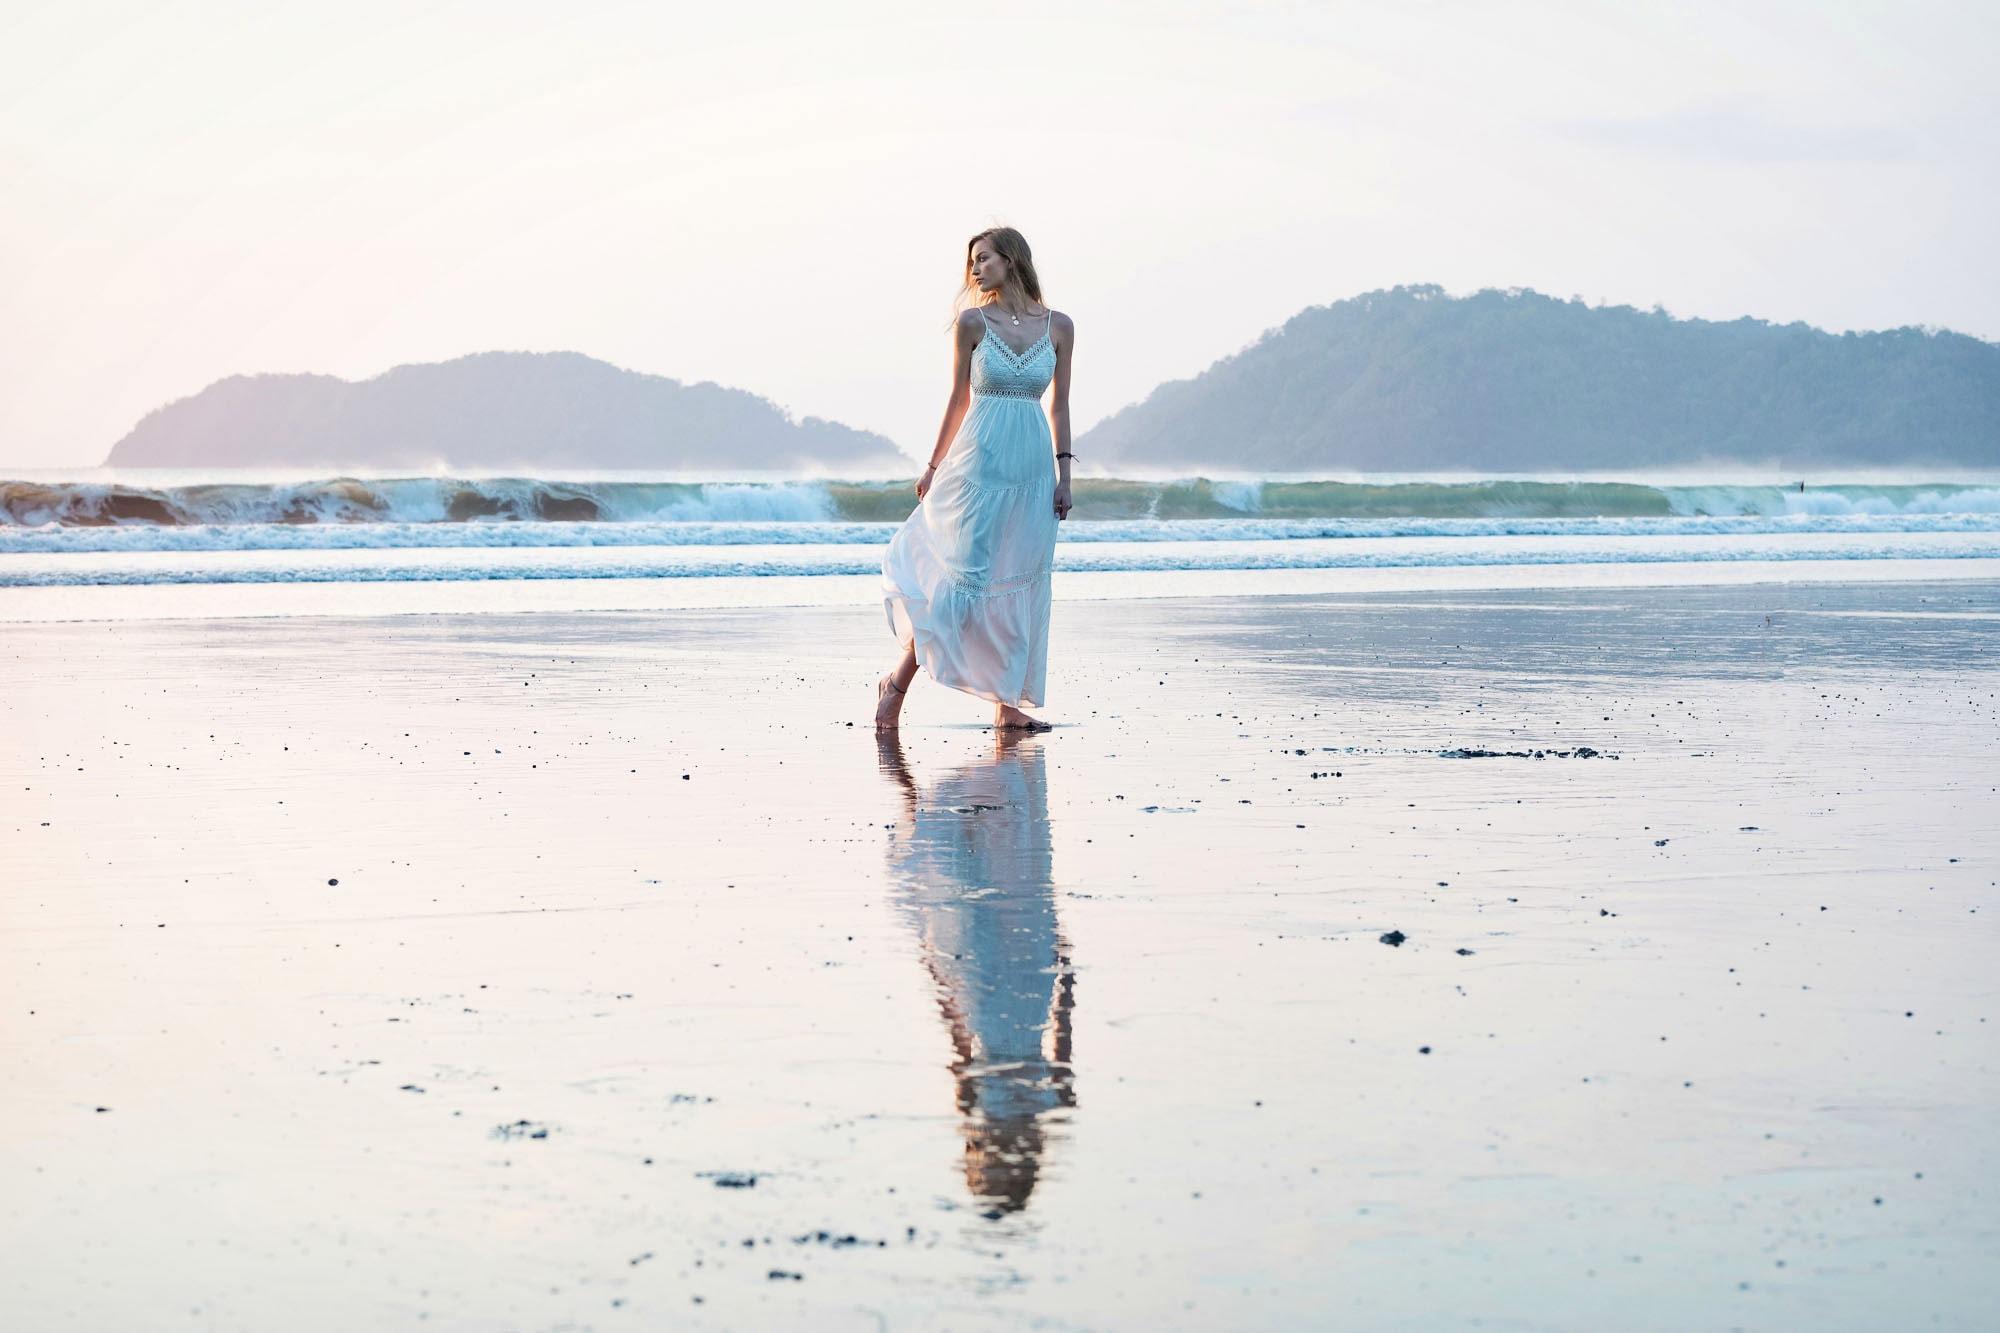 Senior portraits along the beach in a beautiful white dress